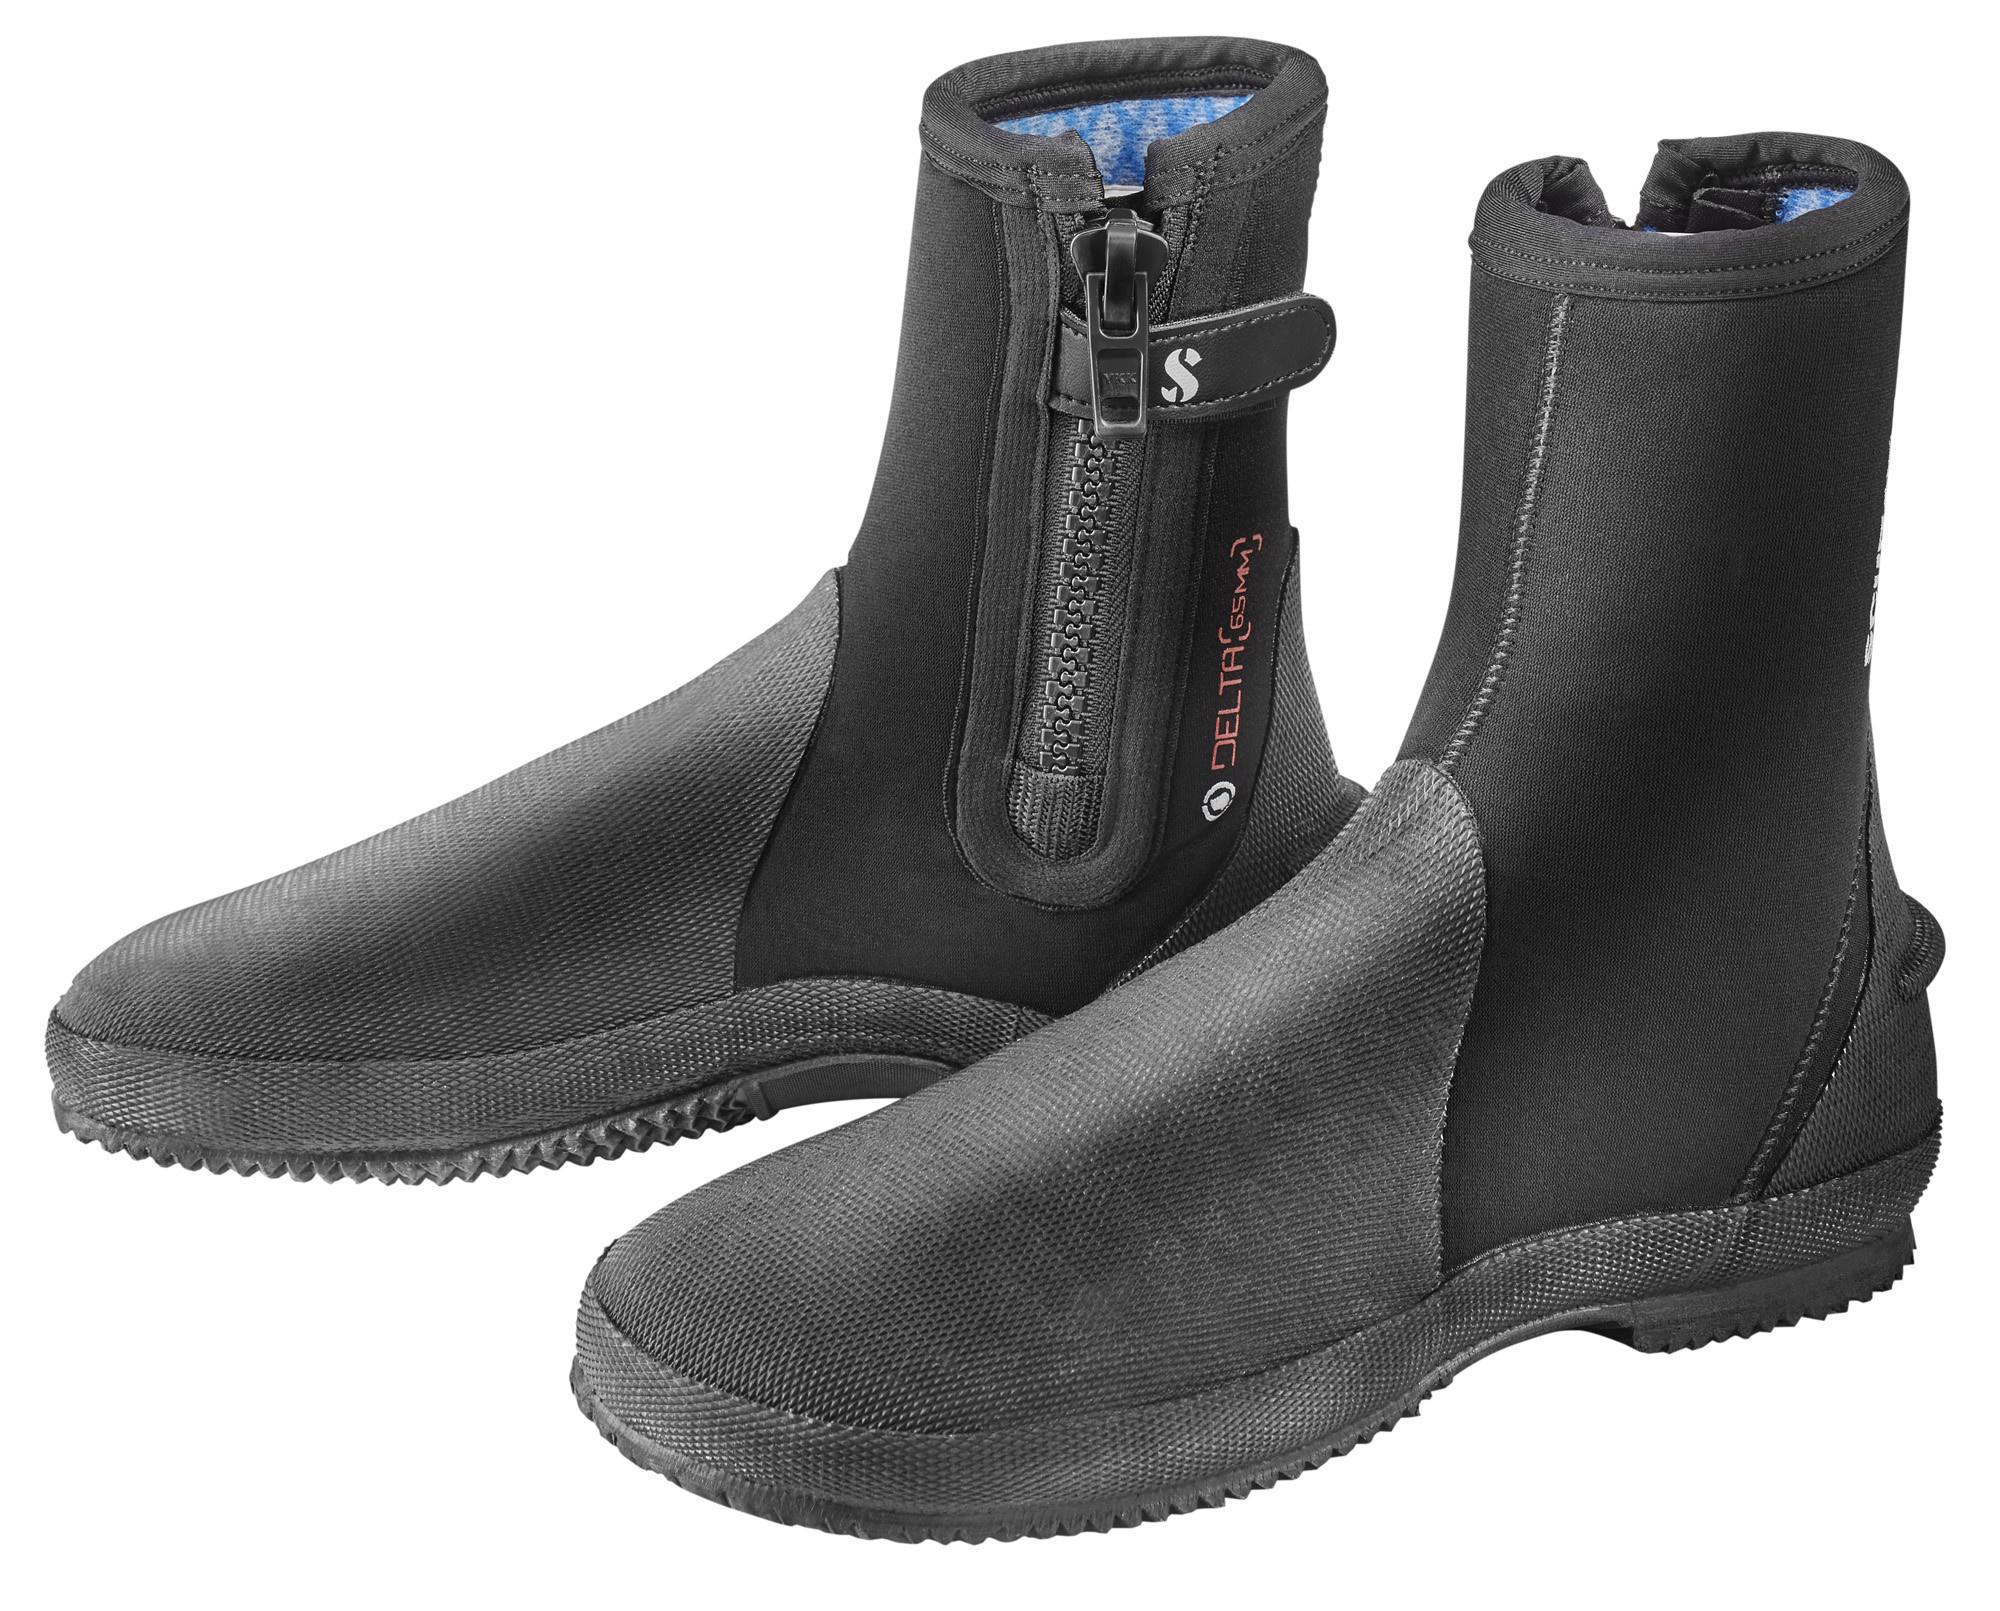 Delta Boot 6.5 mm BK-1